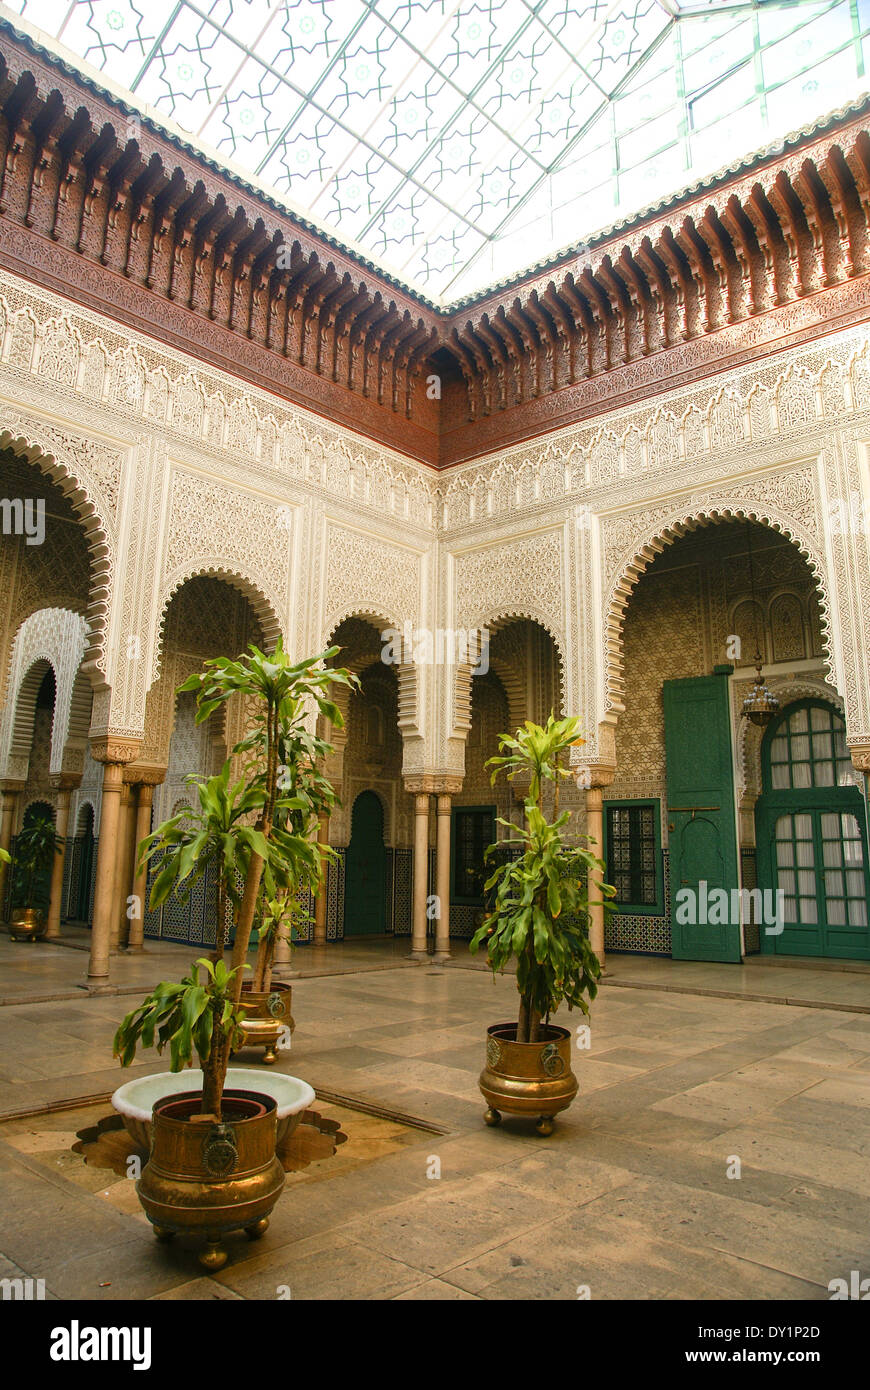 Palais de Justice - Palace of Justice the Local court. Casablanca, Morocco - Stock Image